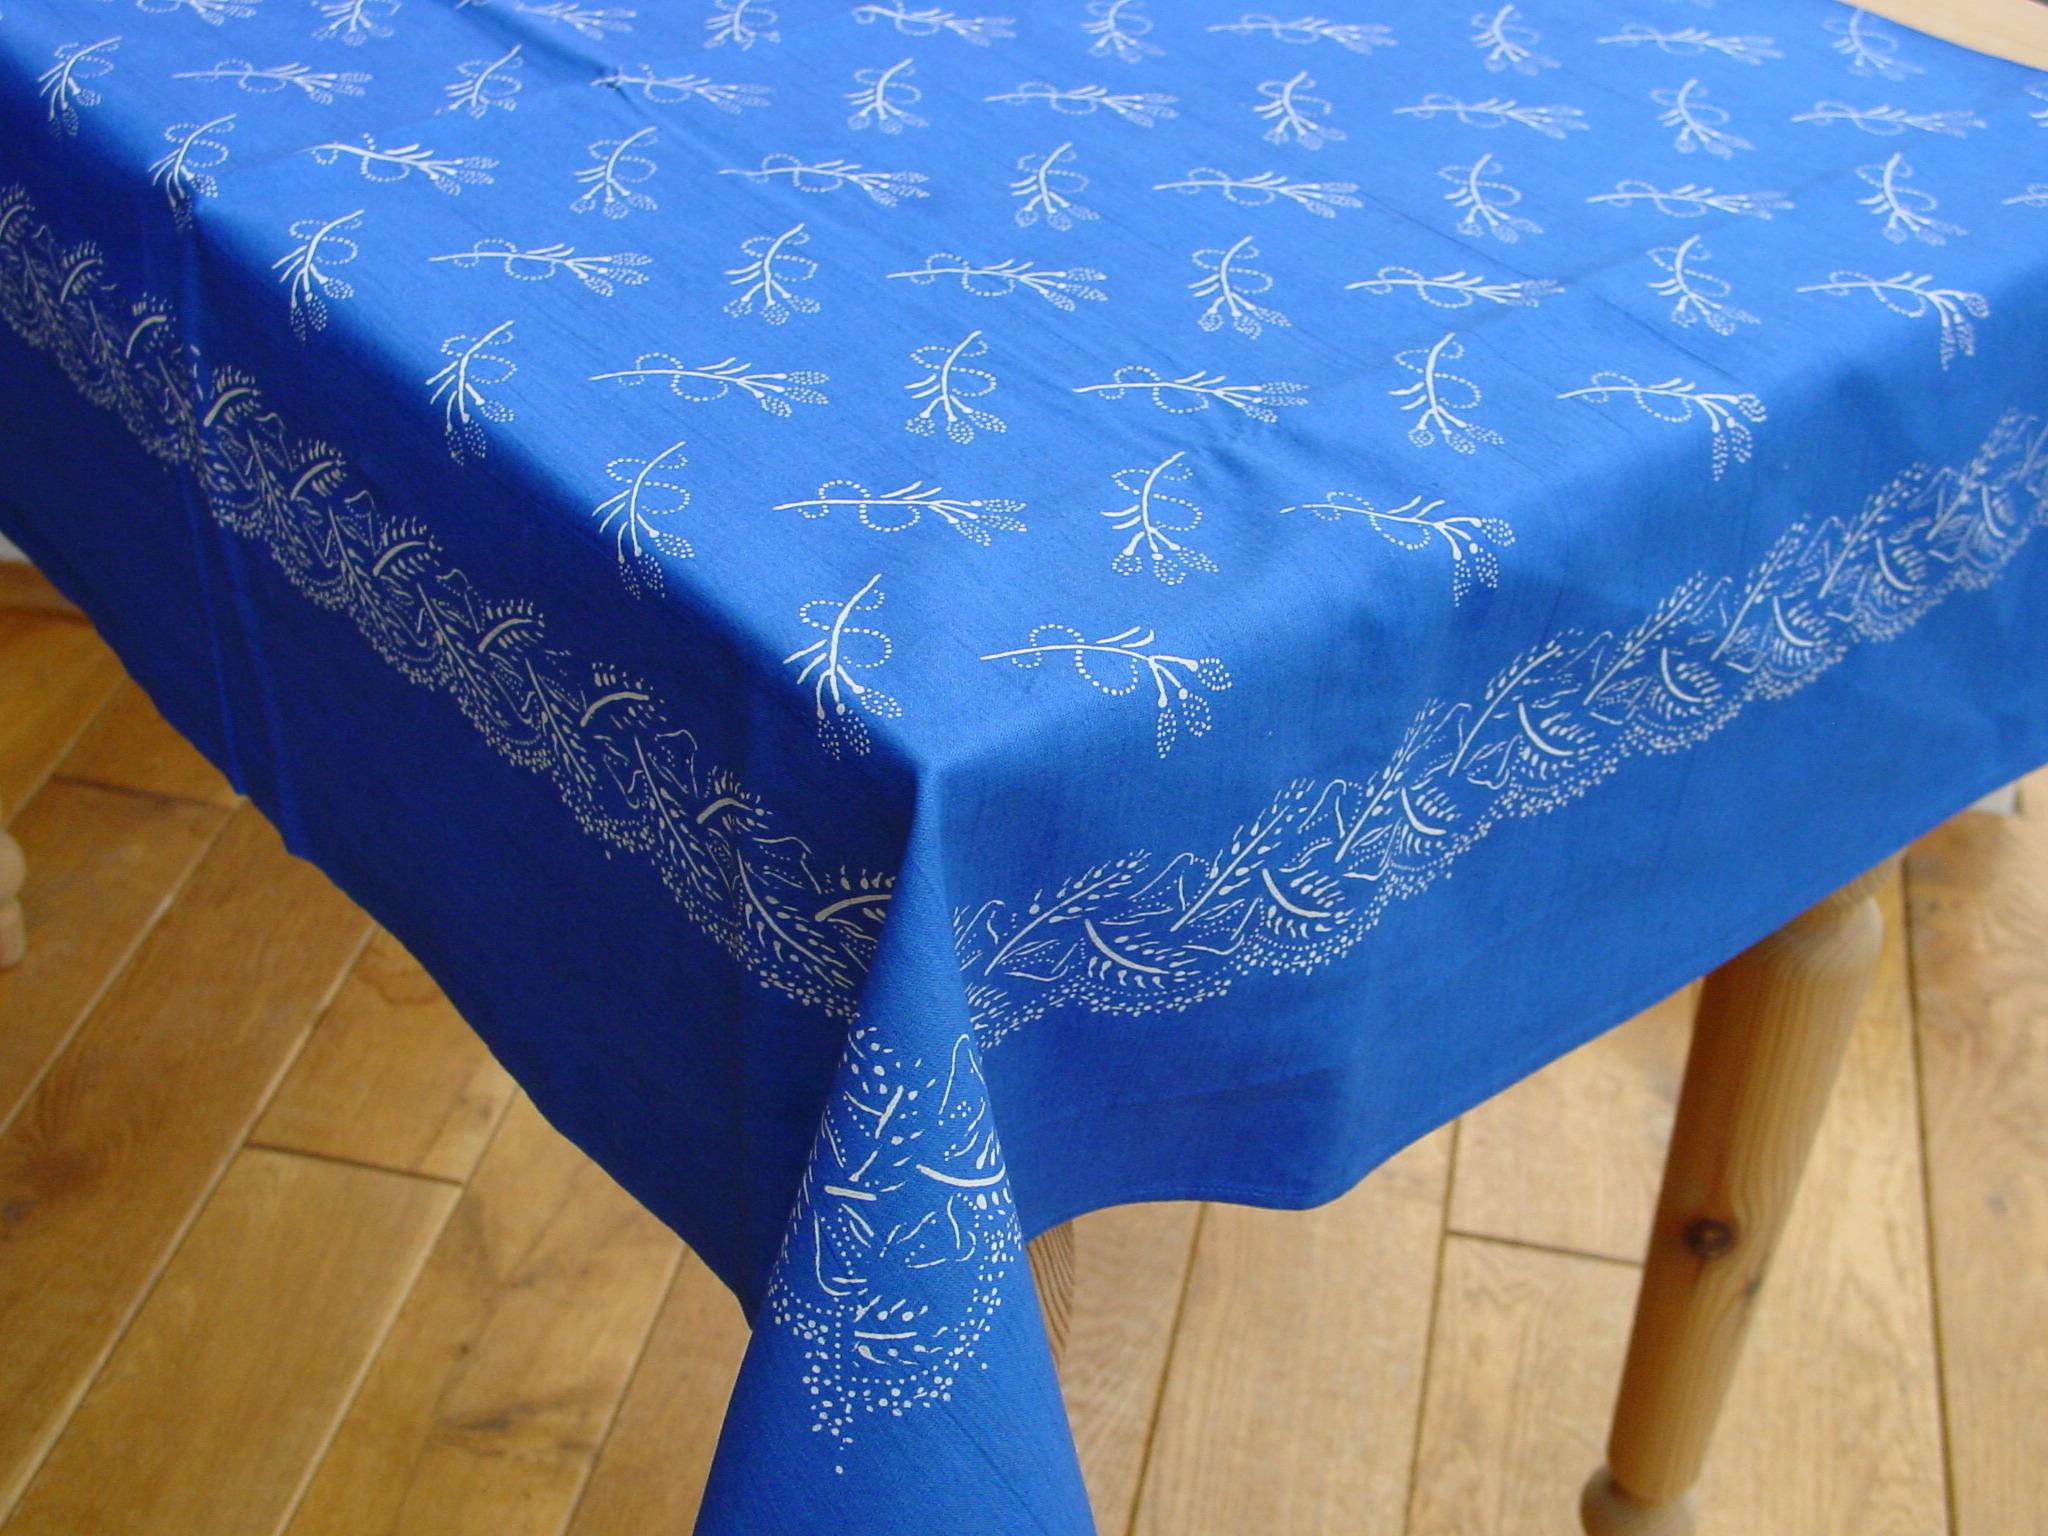 Große Blaudruck-Tischdecke 6477-0